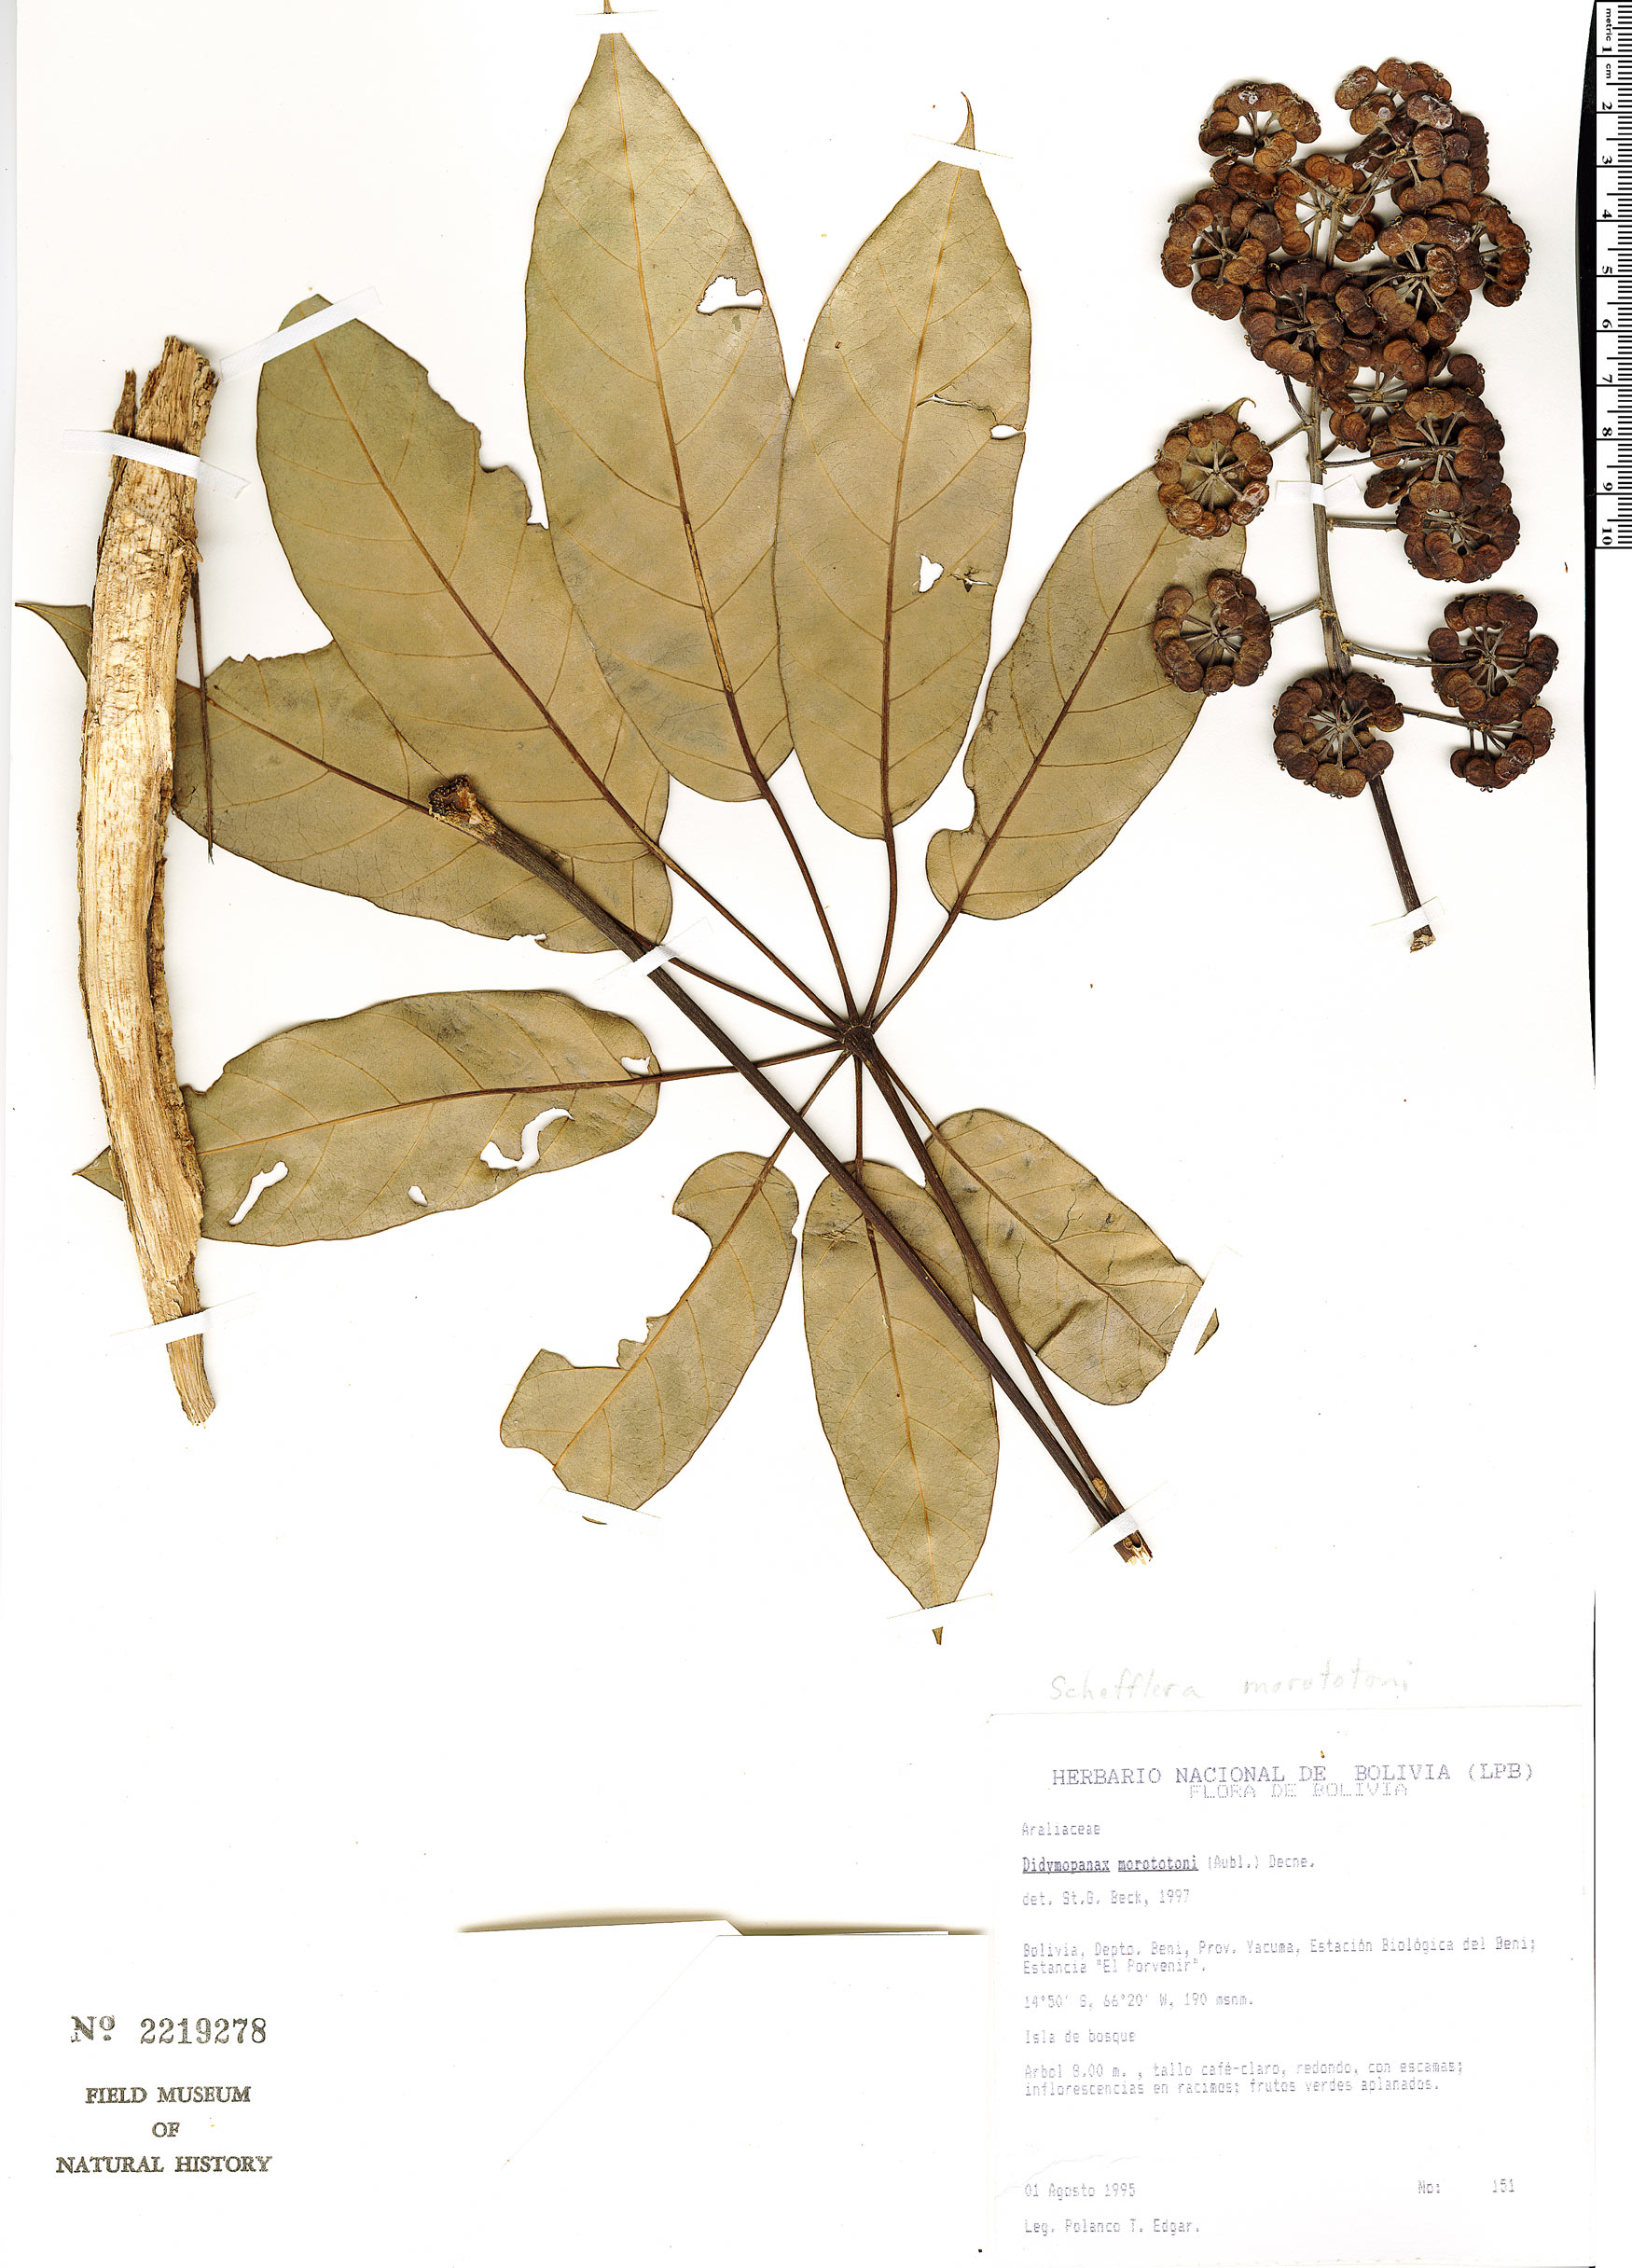 Specimen: Schefflera morototoni